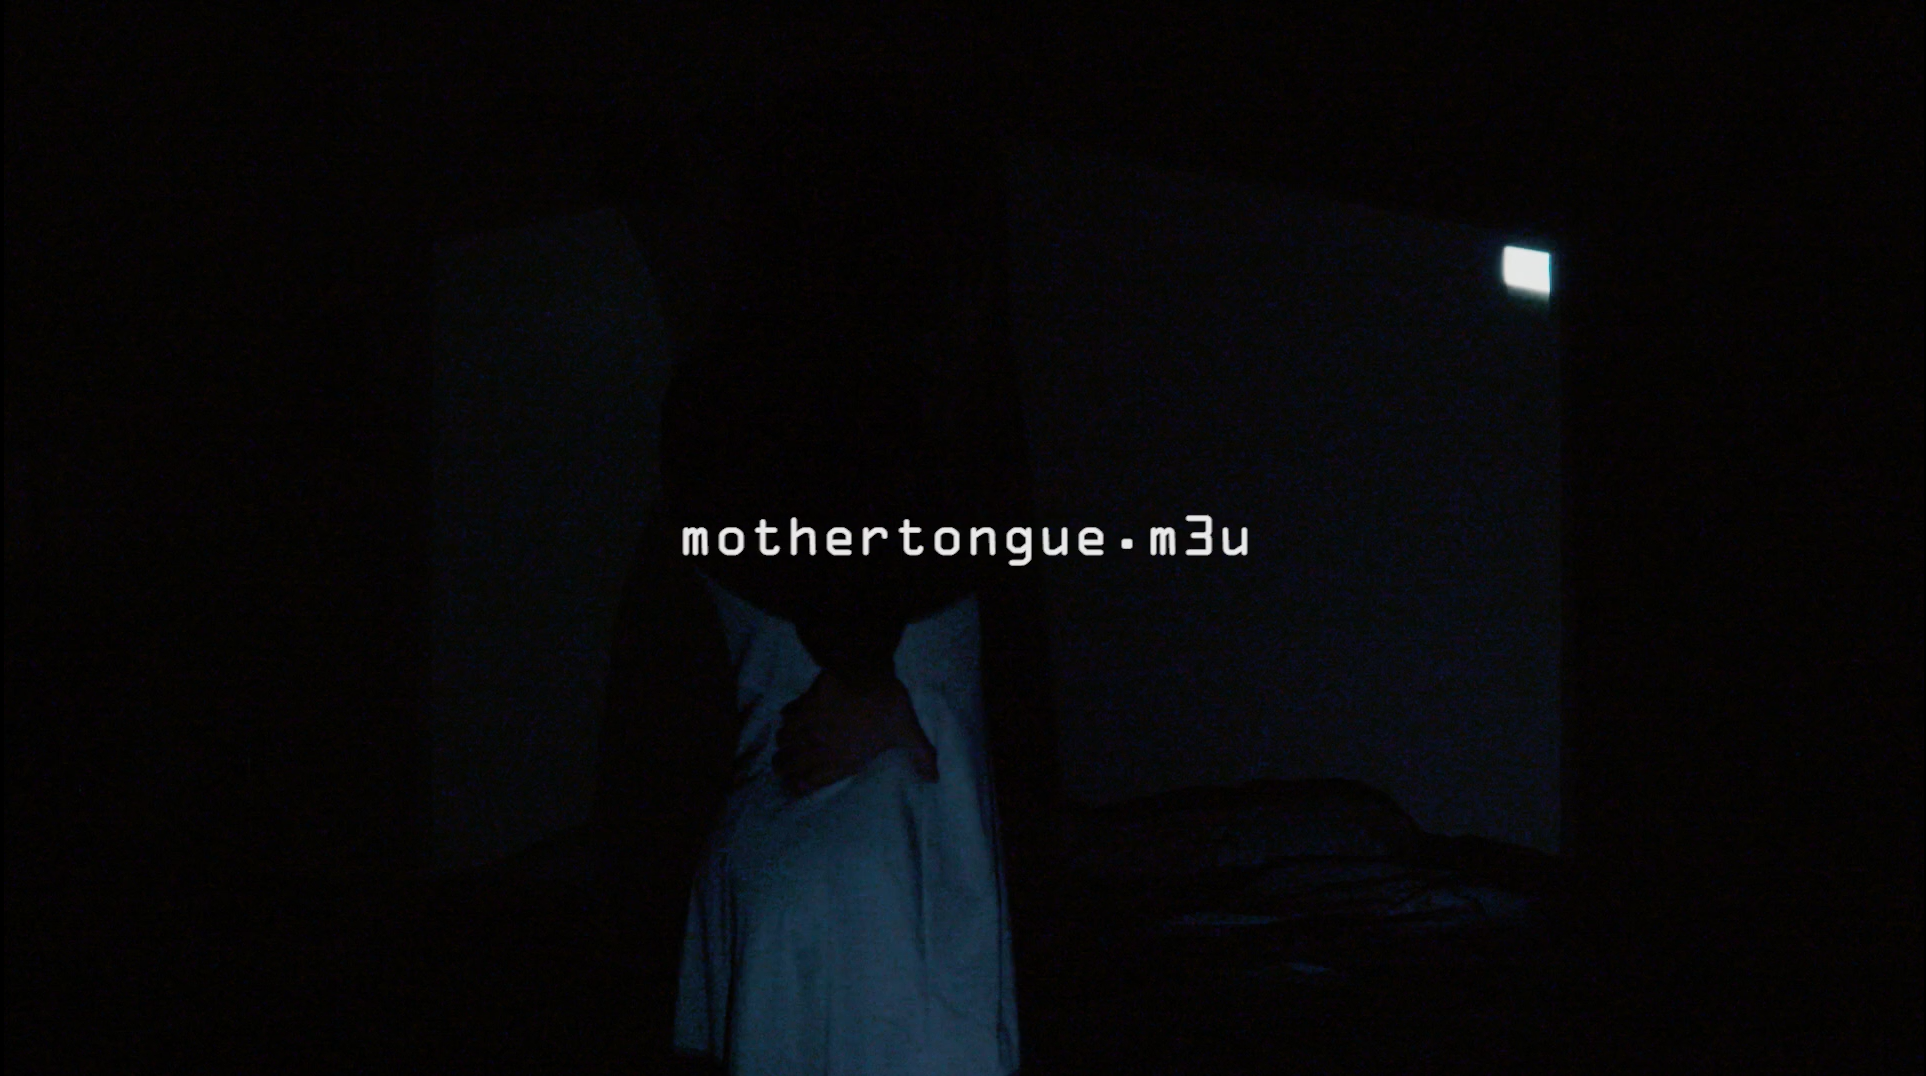 mothertongue.m3u (Music Video, 2017)